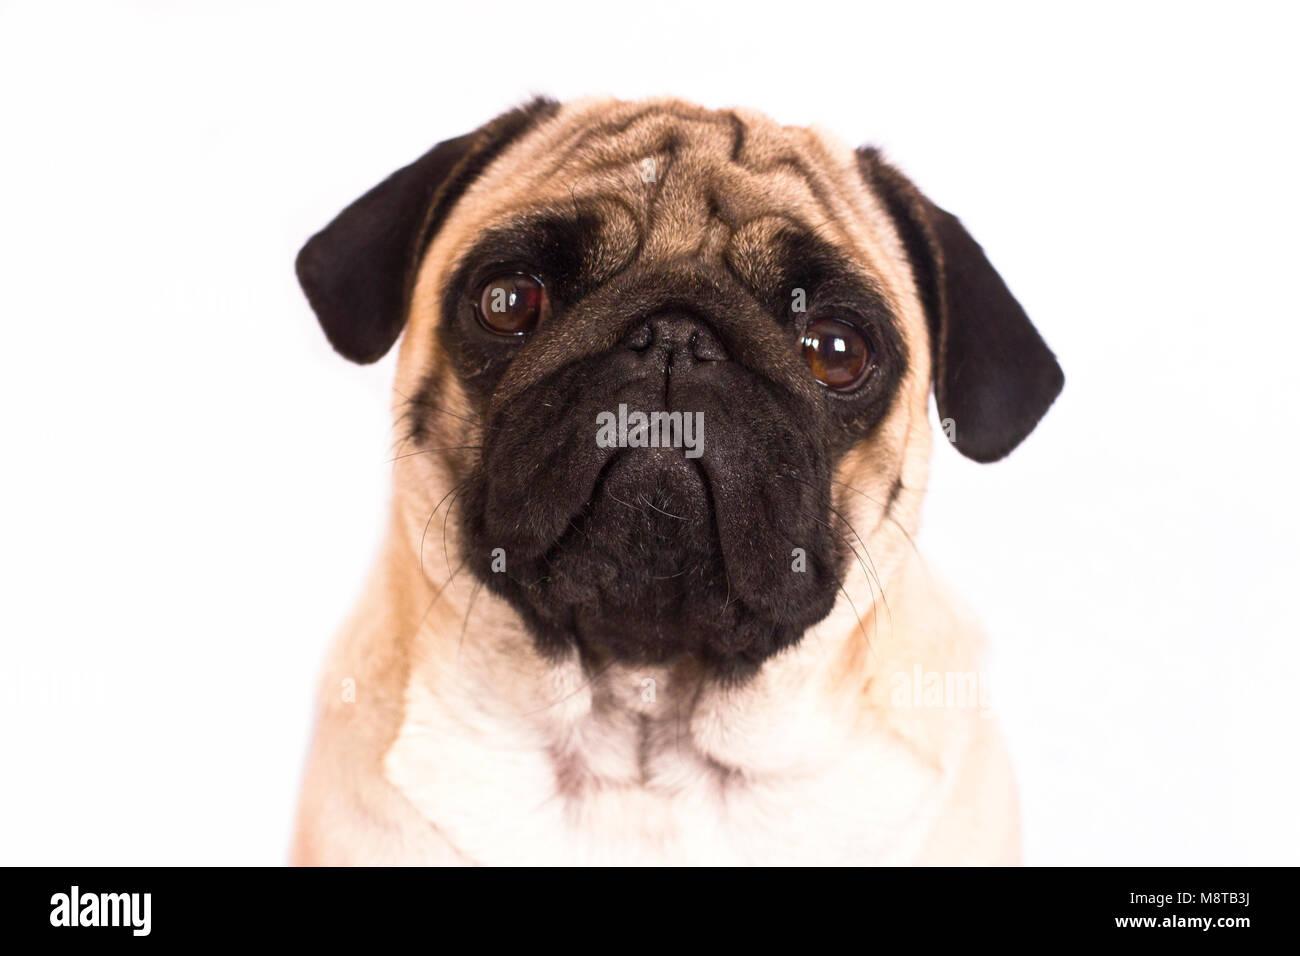 The pug dog sits and looks directly into camera. Sad big eyes. - Stock Image